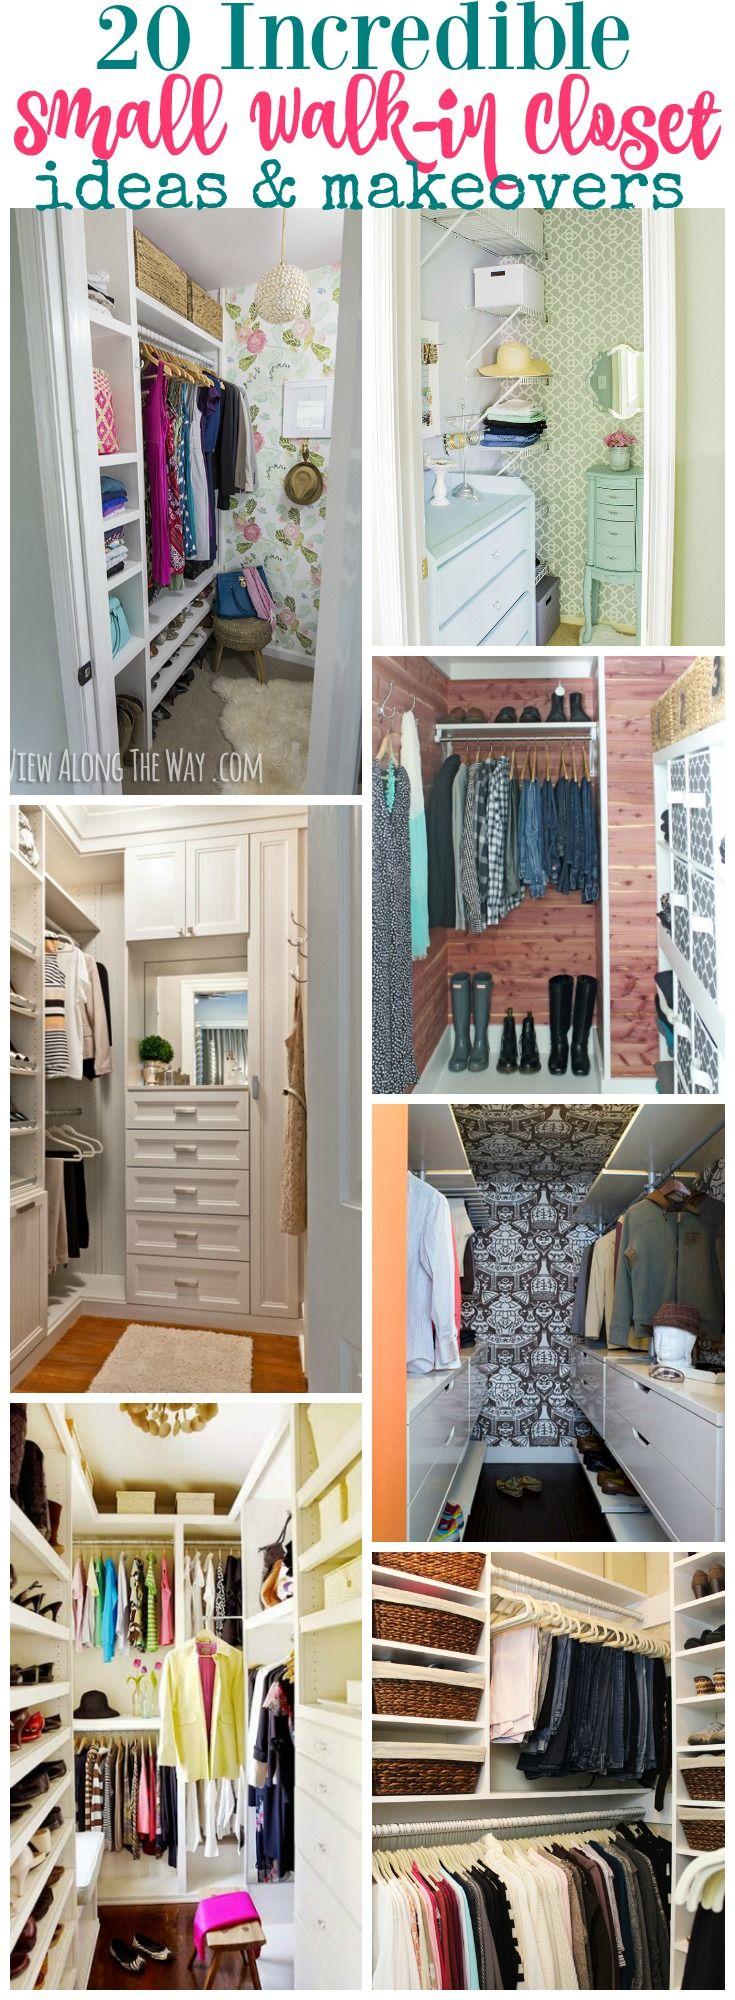 20 Incredible Small Walk In Closet Ideas U0026 Makeovers. Walk In Closet  Organization ... Part 51